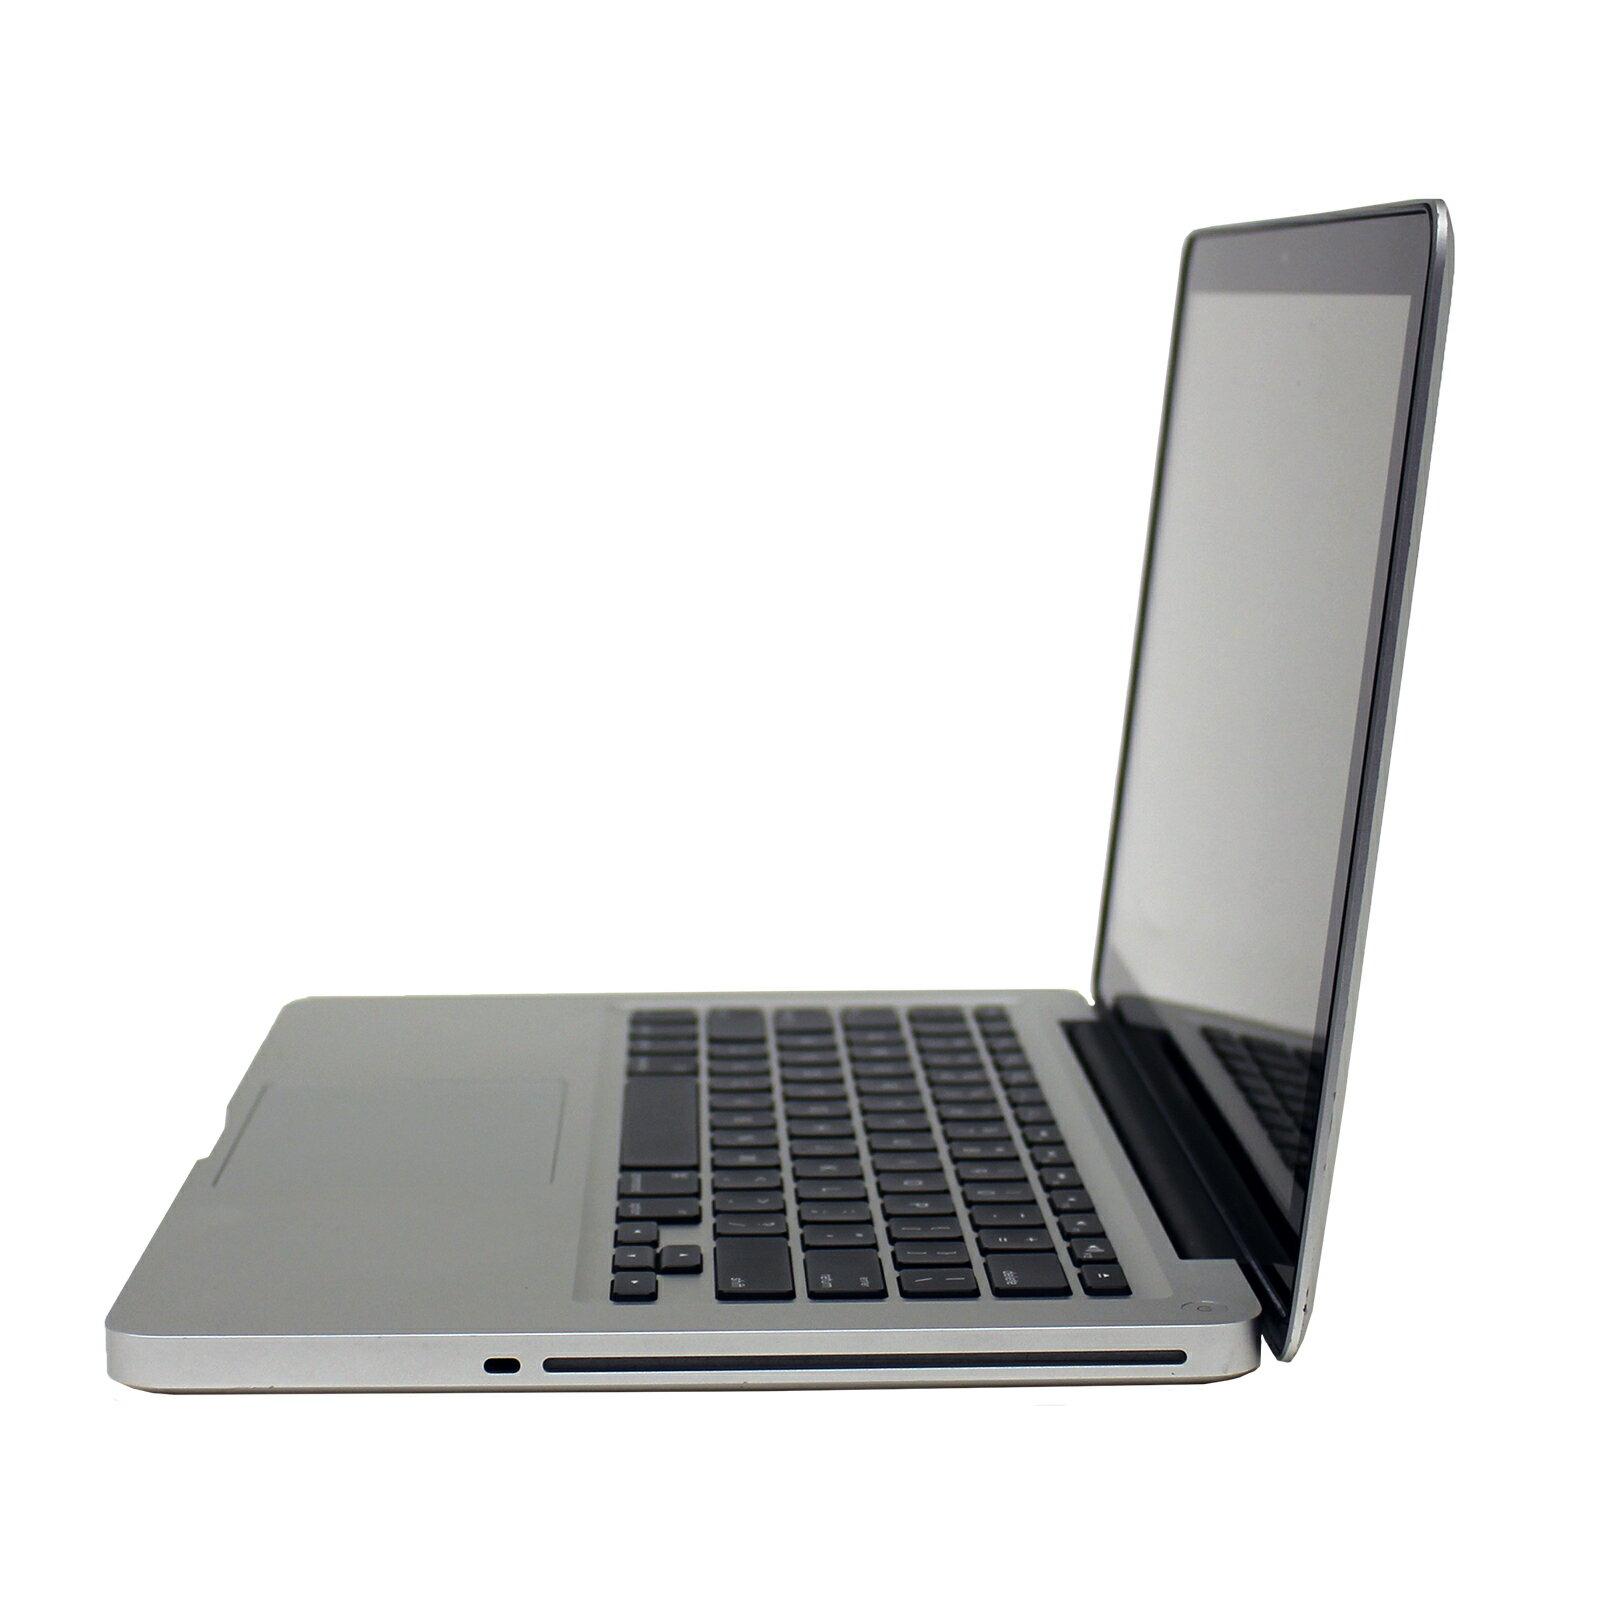 Apple MacBook Pro Mid 2012 A1278 13